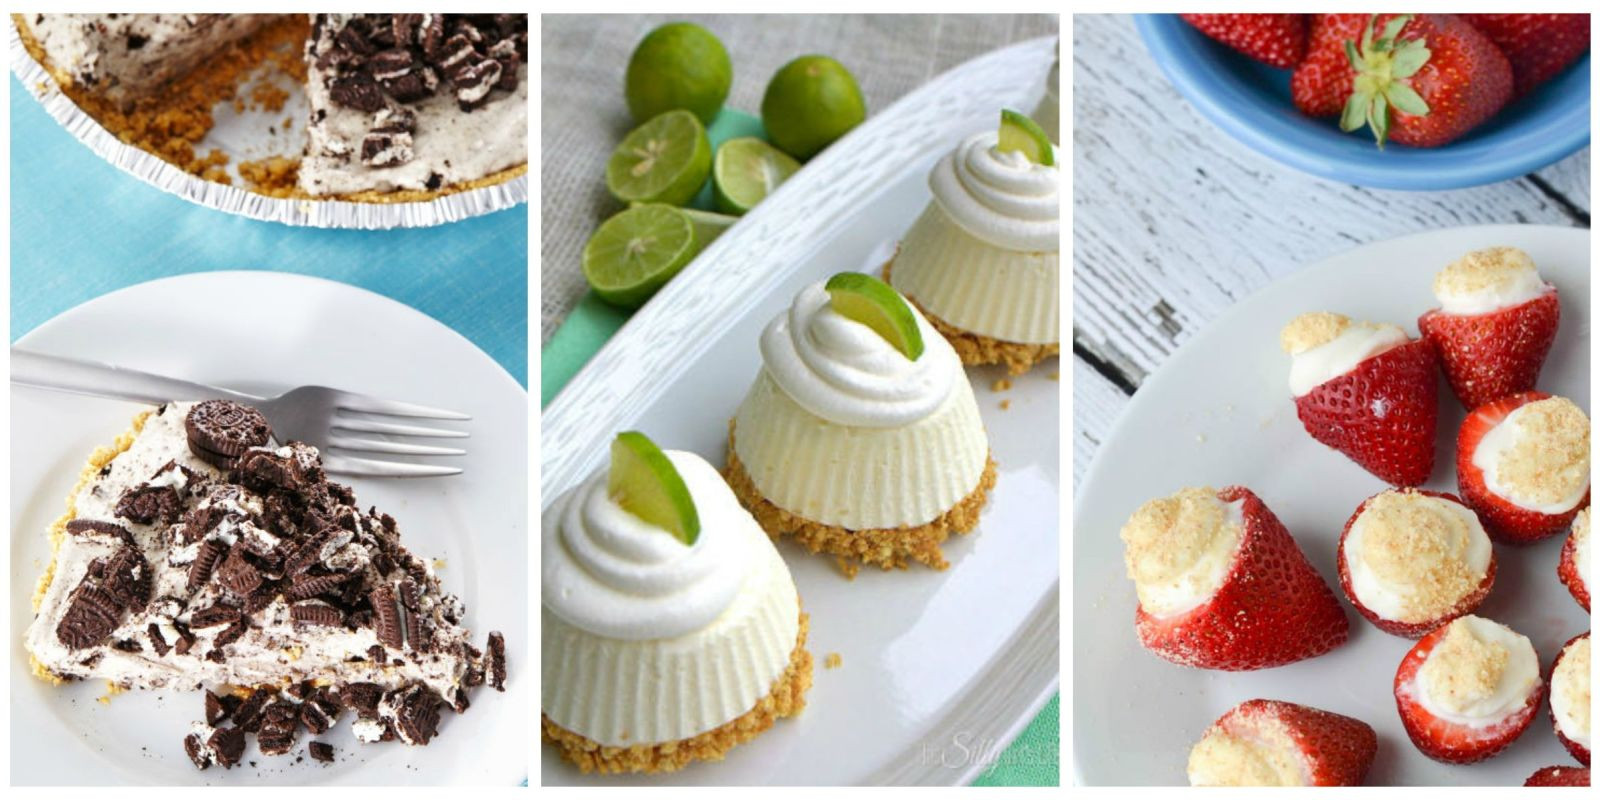 Best Summertime Desserts  57 Easy Summer Desserts Best Recipes for Frozen Summer